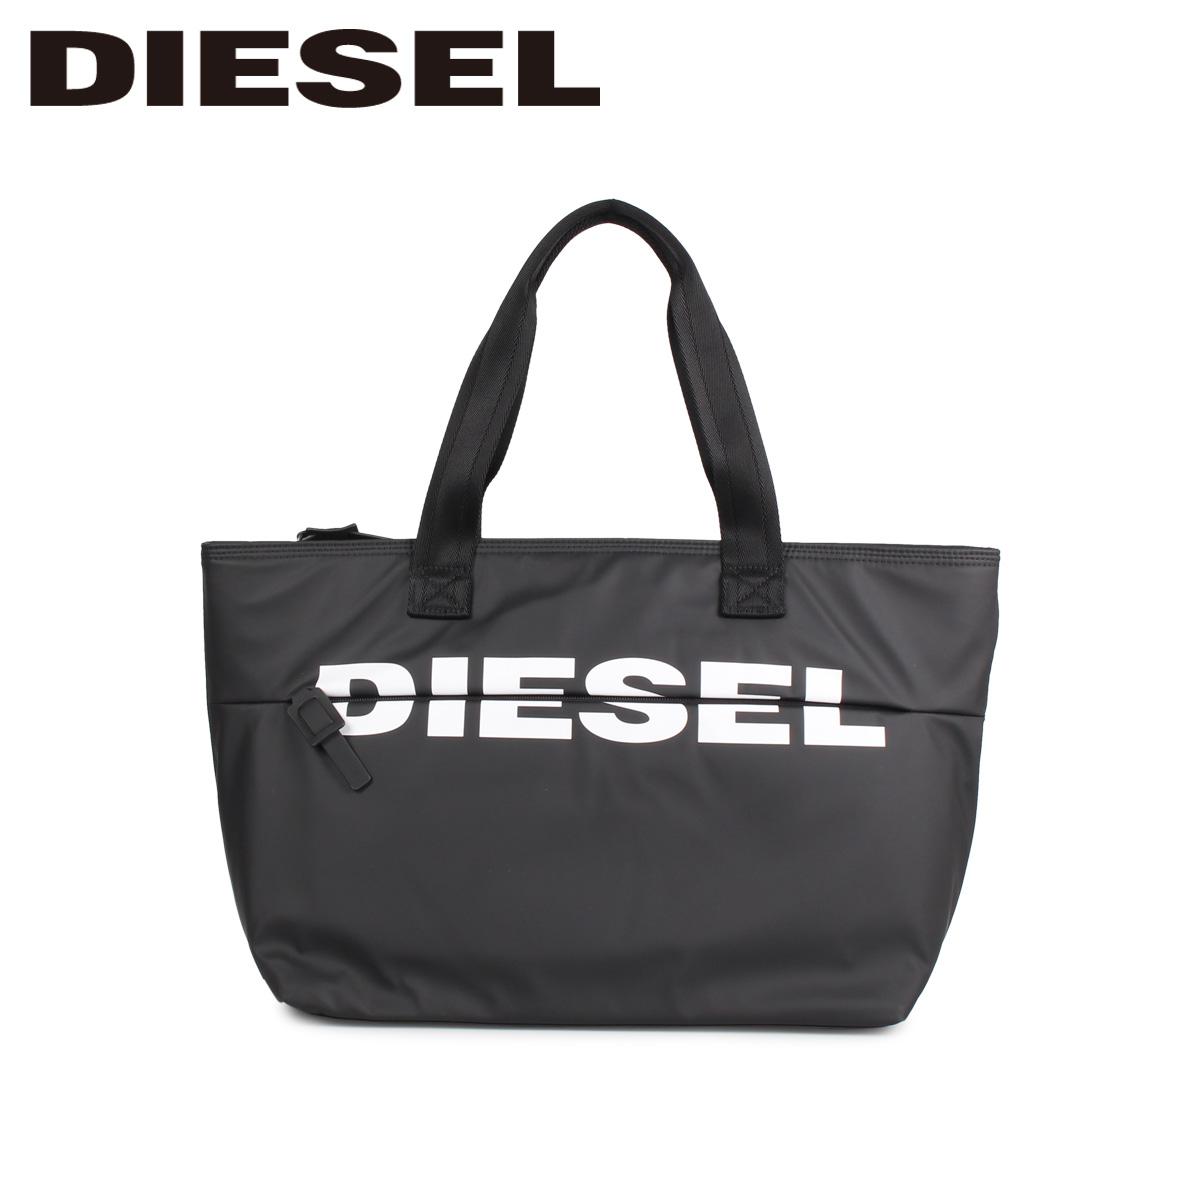 DIESEL ディーゼル バッグ トートバッグ レディース BOLDMESSAGE ブラック 黒 X06248-P1705